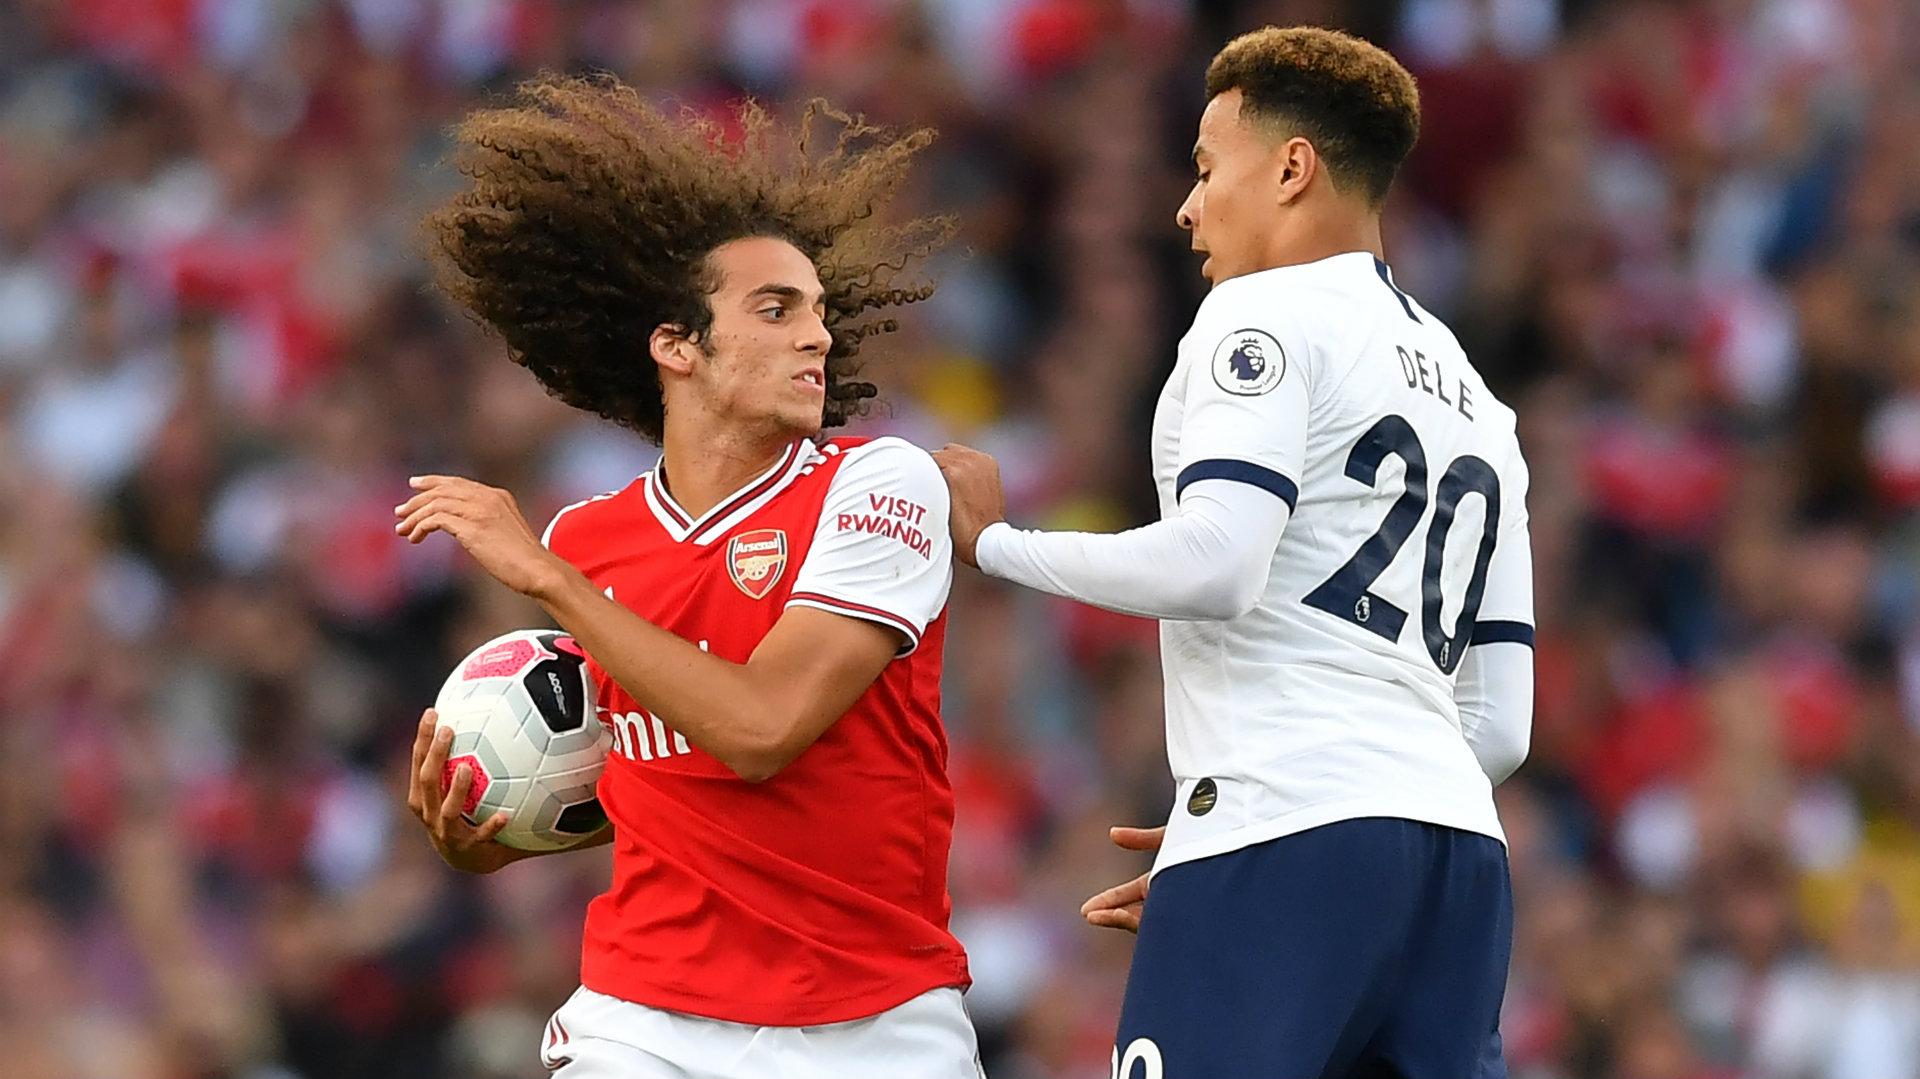 'Guendouzi needs to grow up' - Arsenal star warned over future behaviour